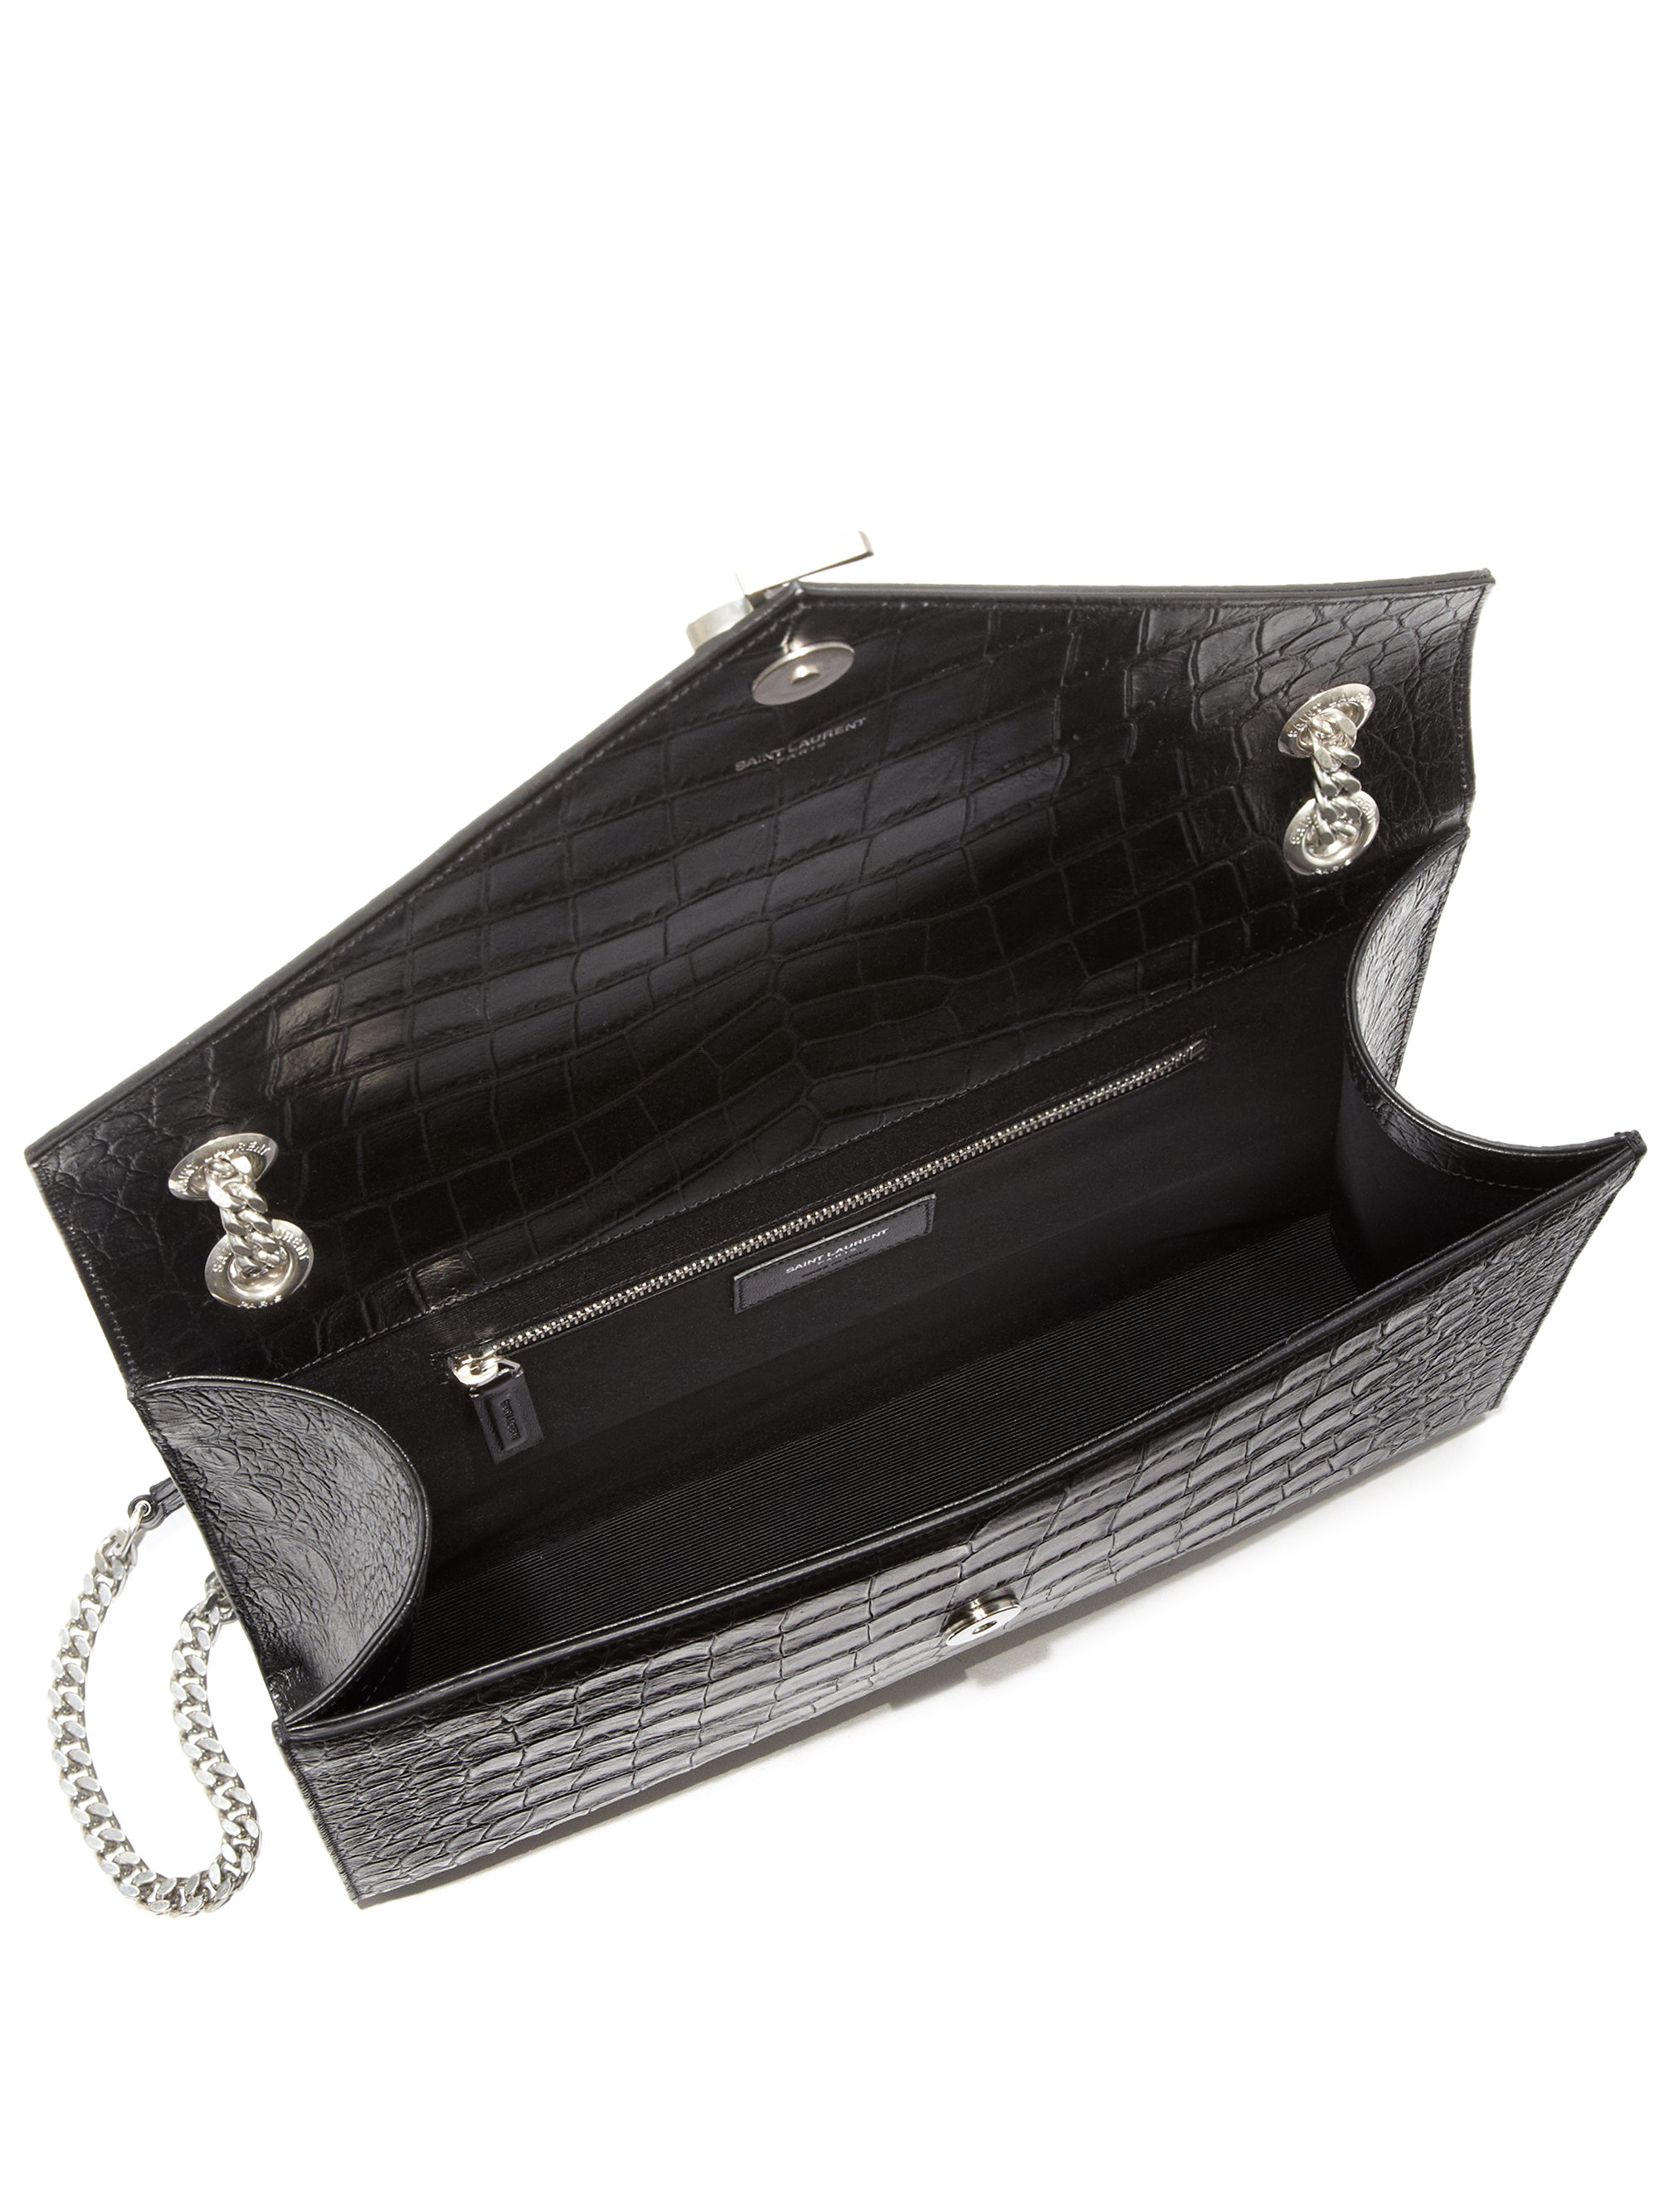 iv sen loren shoes - Saint laurent Monogram Medium Crocodile-embossed Leather Envelope ...